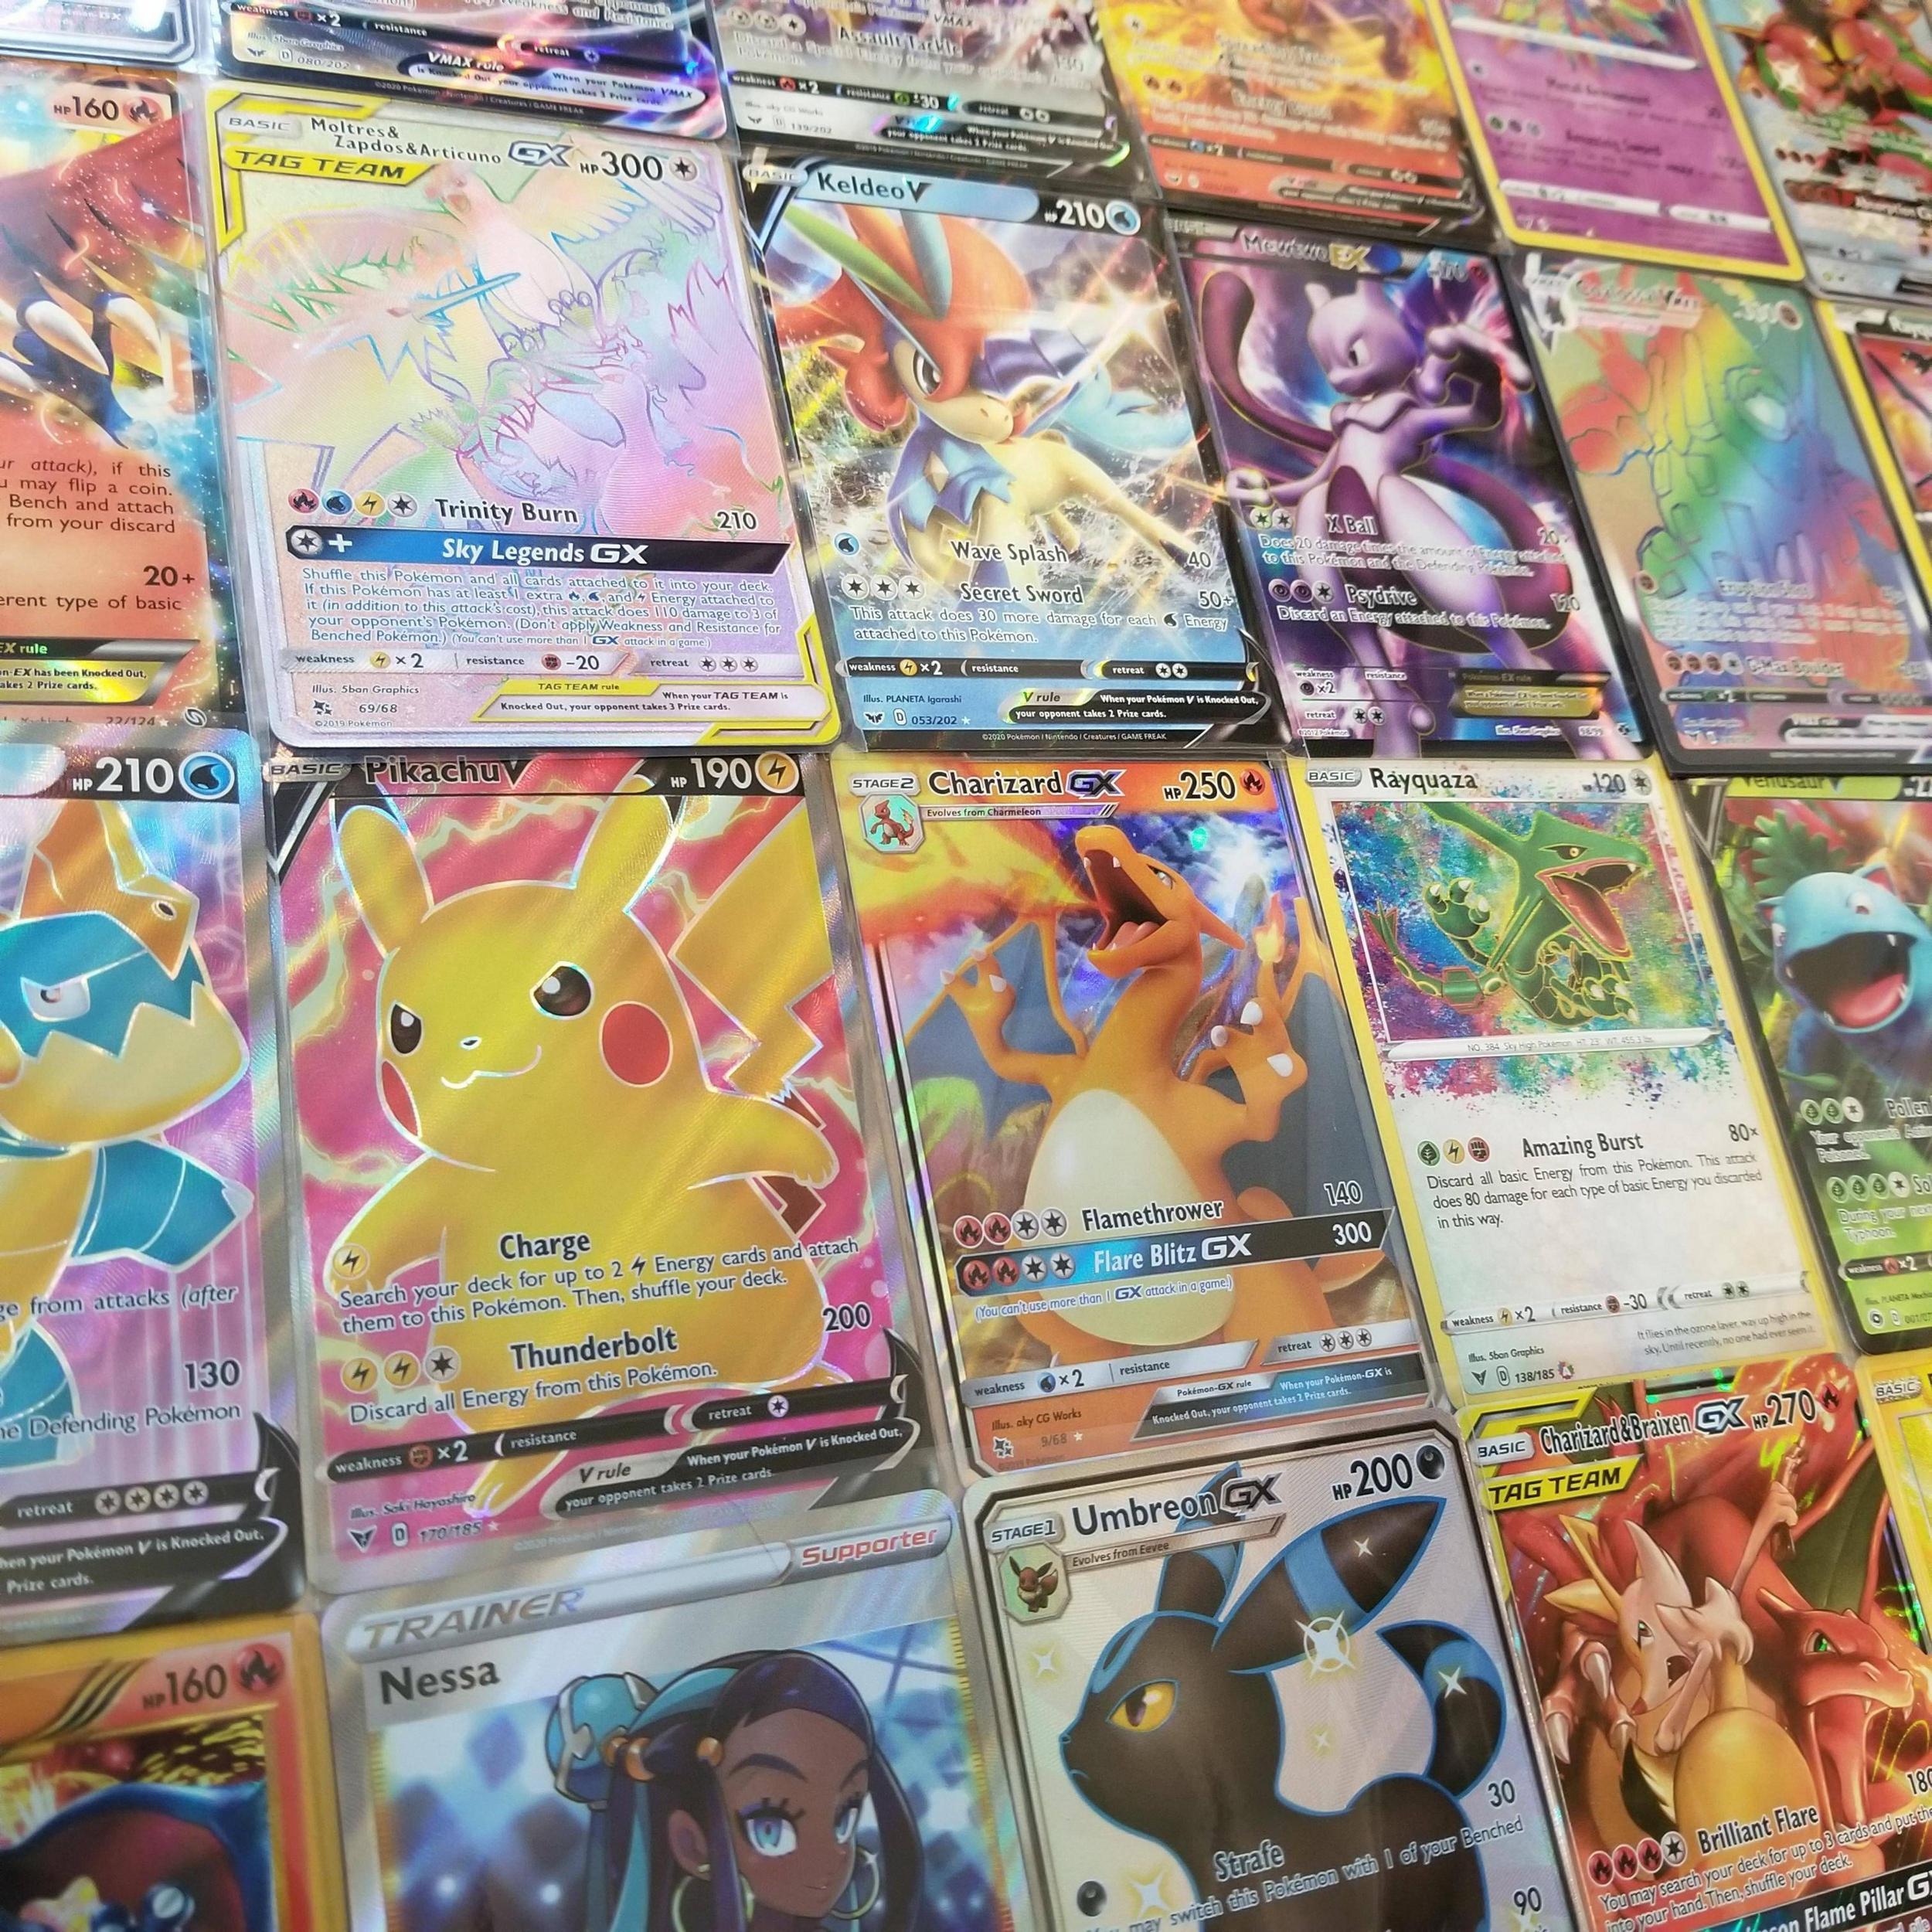 POKEMON TRADING CARD GX 5 CARD LOT ALL ULTRA RARE OR FULL ART FAST SHIPPING